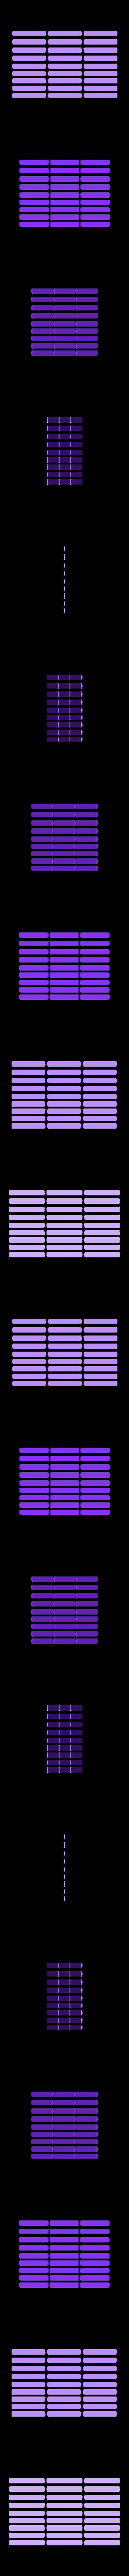 BluetezeitBasis.stl Download free STL file Name Labels / Tags for Dominion Card Cases (German) (Namenschilder Deutsch) • 3D print model, plokr